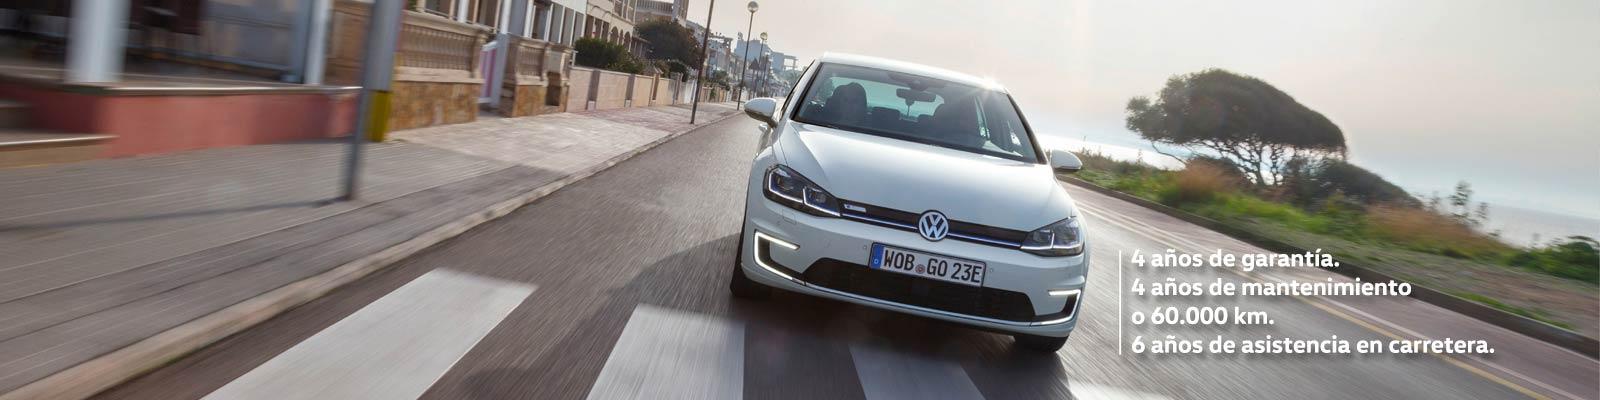 Volkswagen GOLF ADVANCE 1.6 TDI 115CV